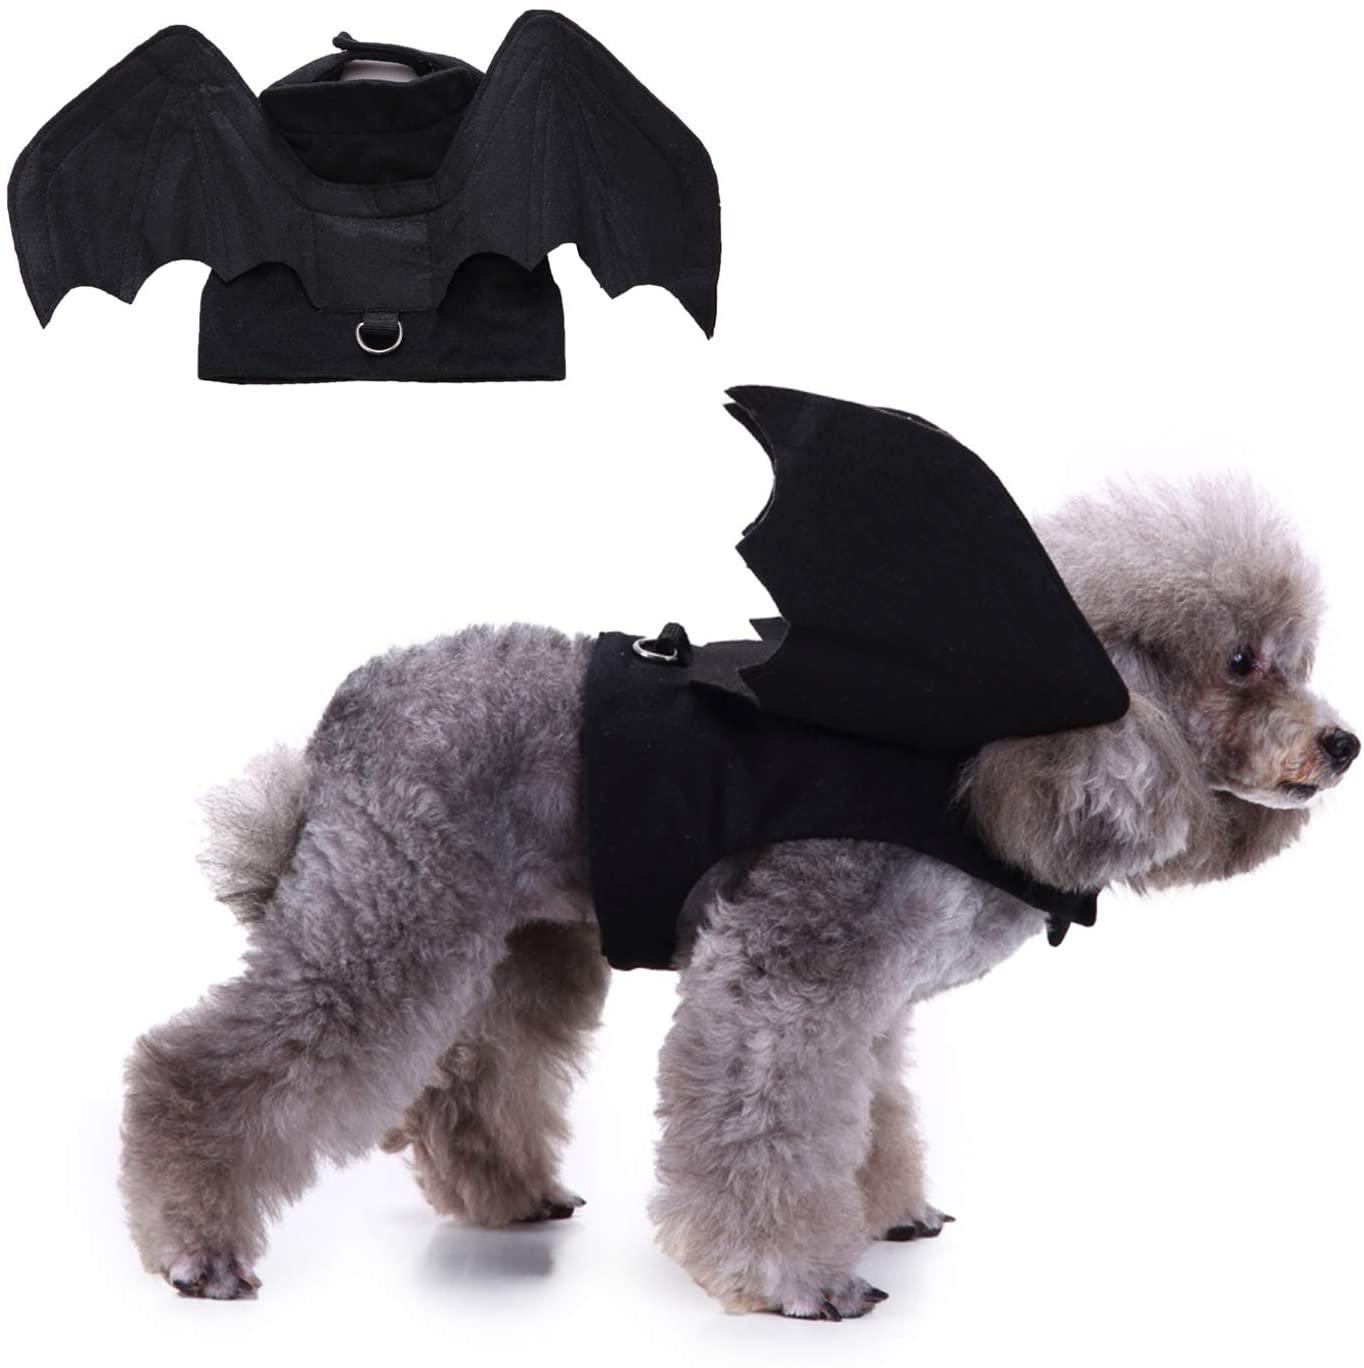 RYPET Pet Halloween Costume - Halloween Bat Wings Pet Costumes for Dogs Cats Halloween Party